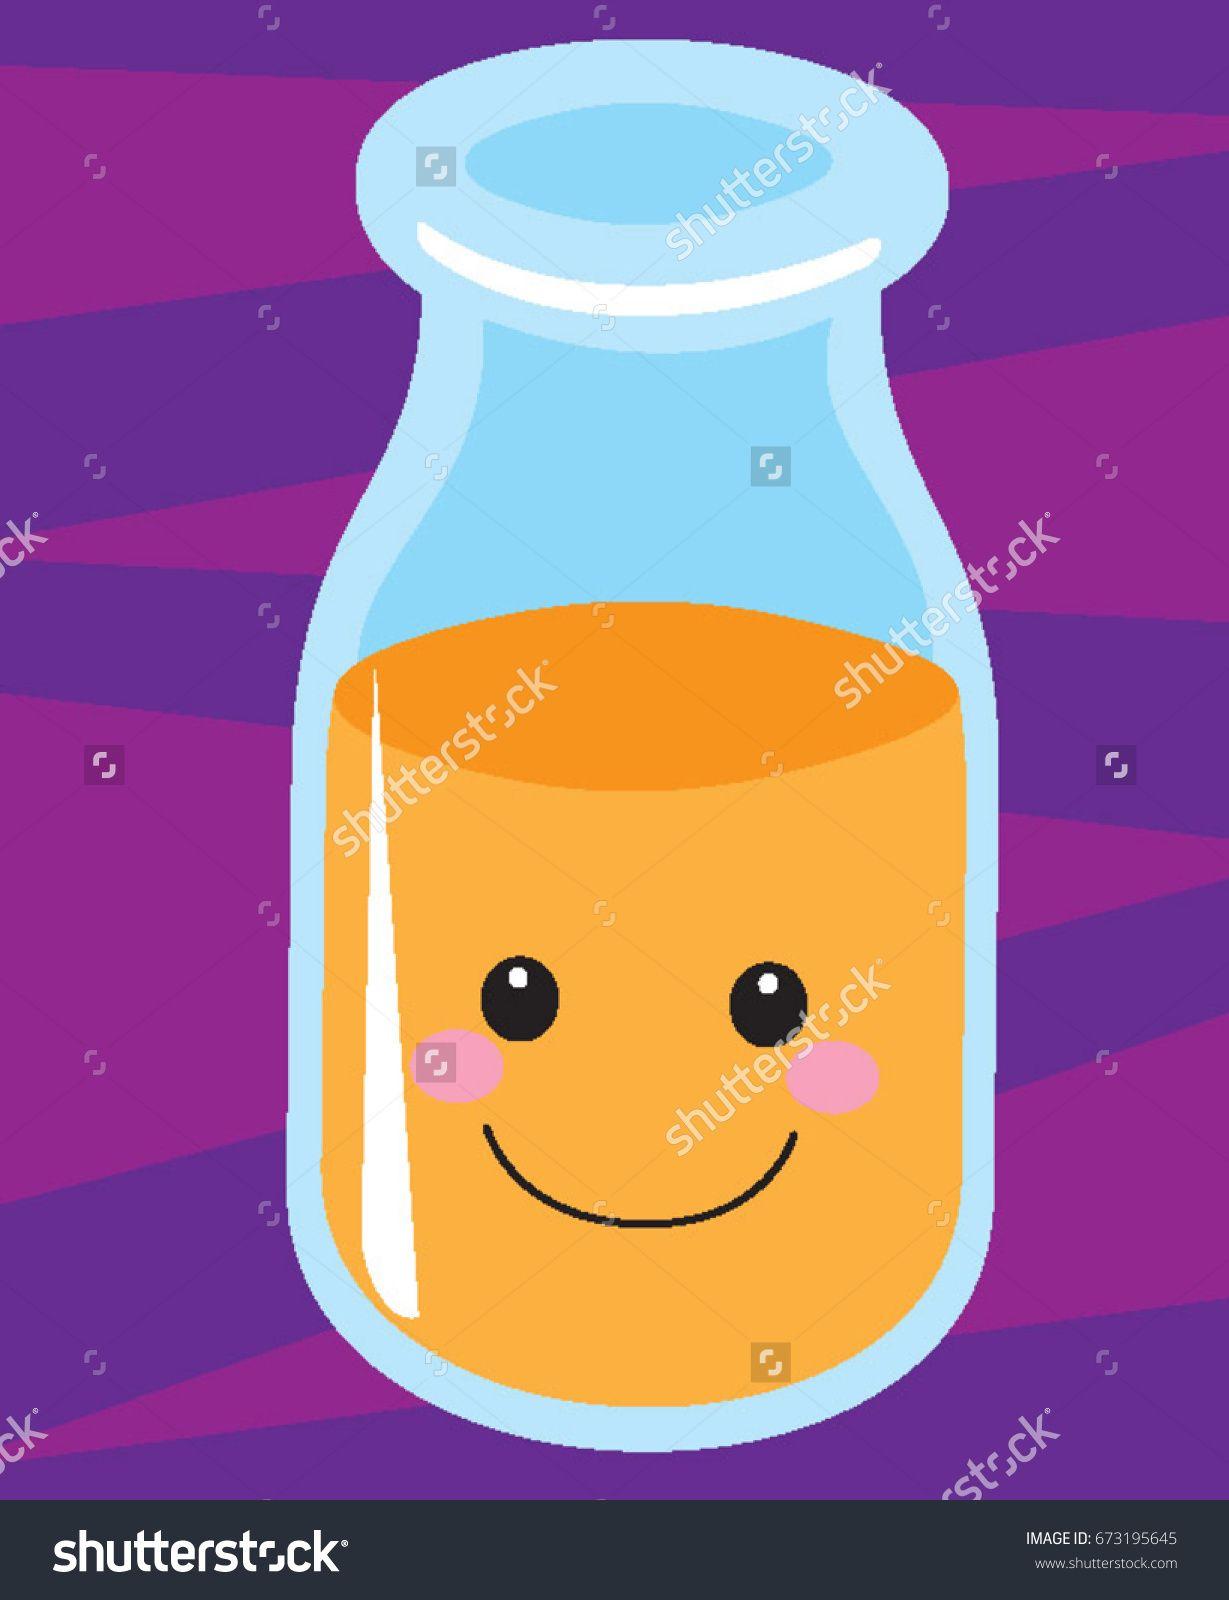 Glass Jar or Jug of Orange Juice With Happy Smiley Emoji